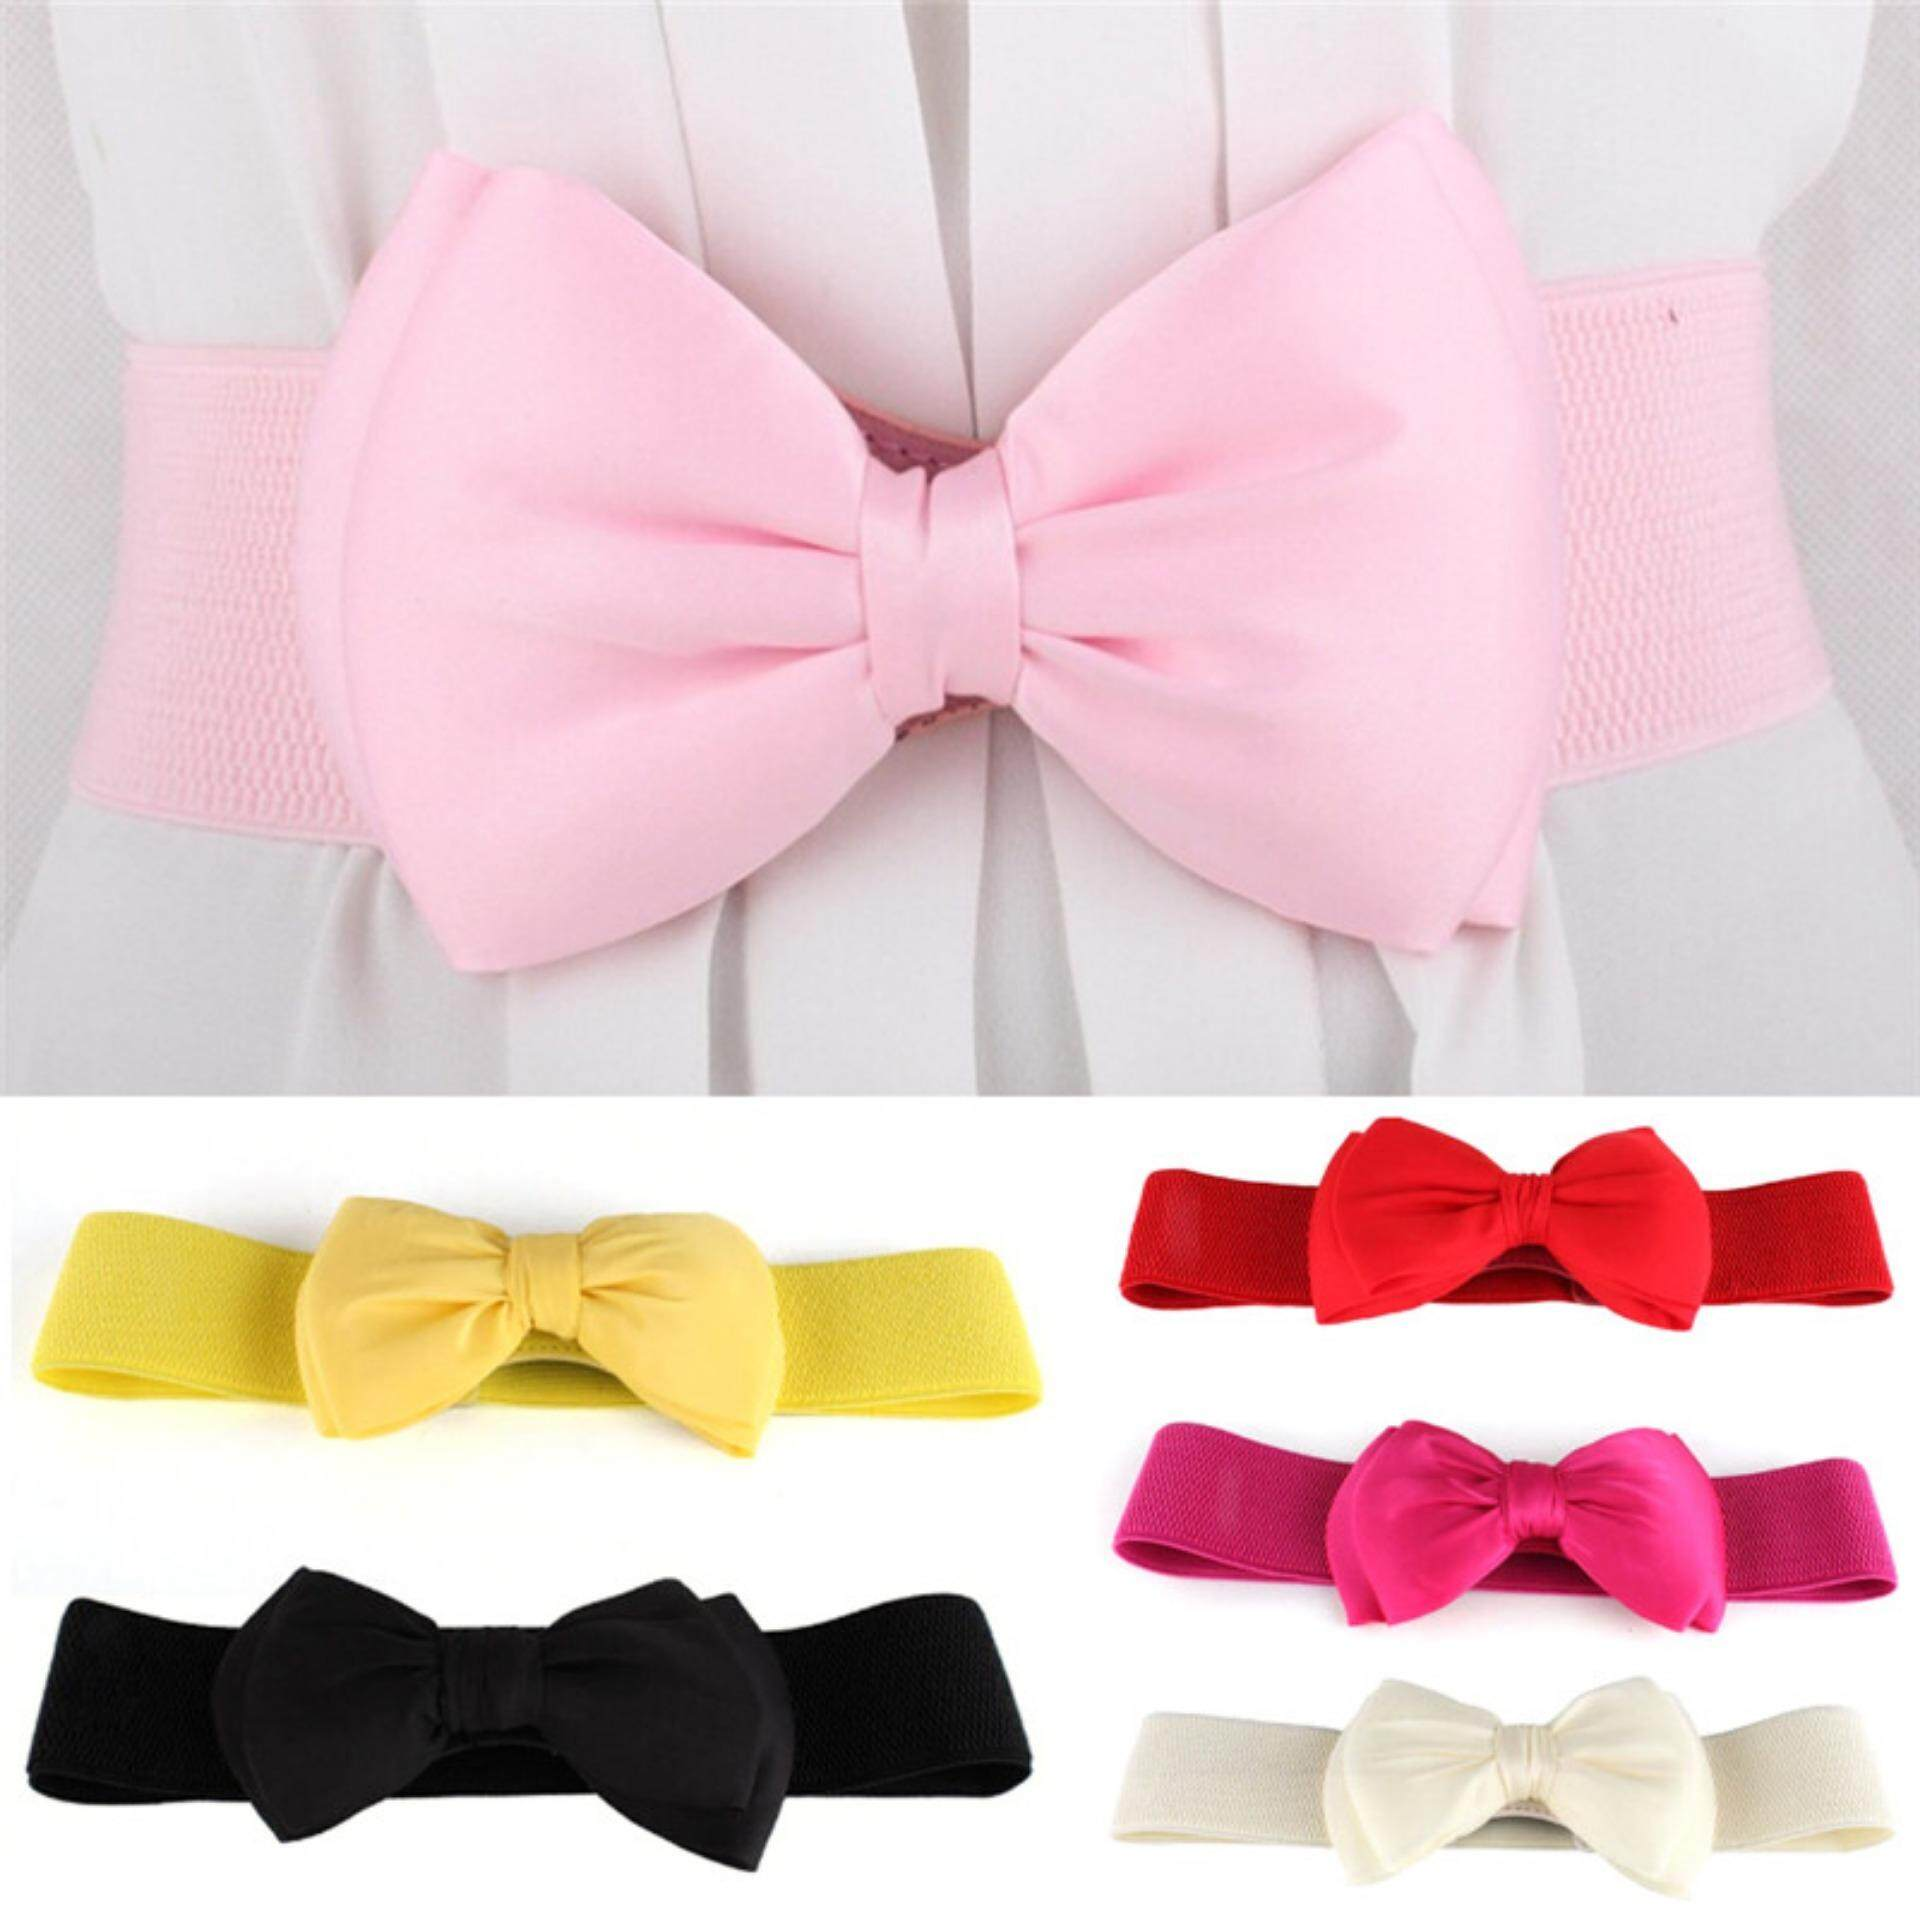 Big Bow Waistband Elastic Wide Dress Stretch Designer for Girls Cinch Belt Decoration .